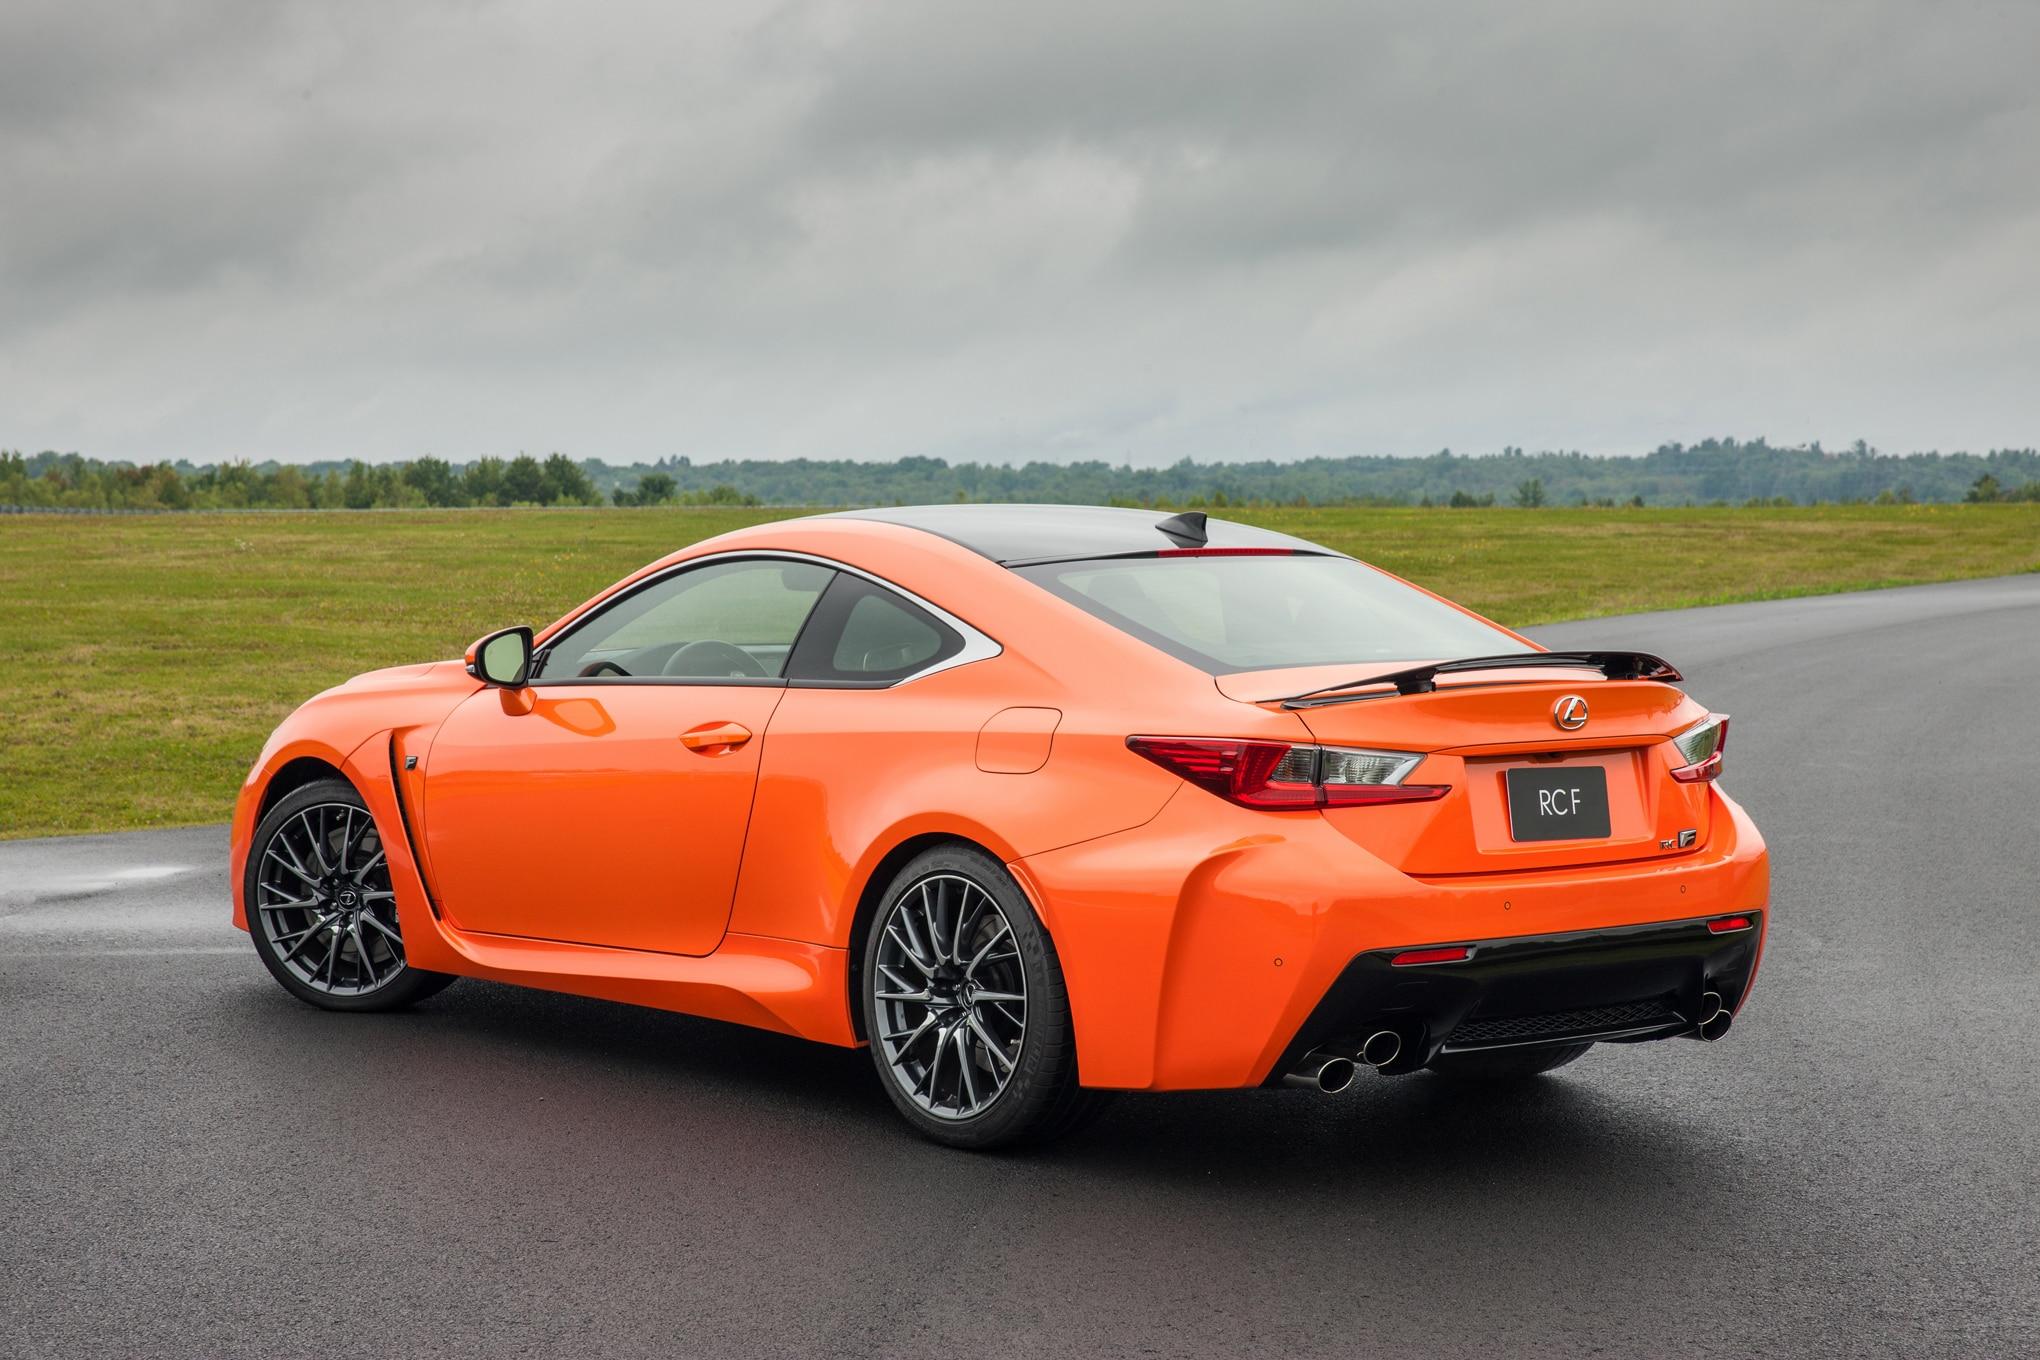 http://st.automobilemag.com/uploads/sites/11/2014/09/2015-Lexus-RC-F-rear-three-quarter1.jpg